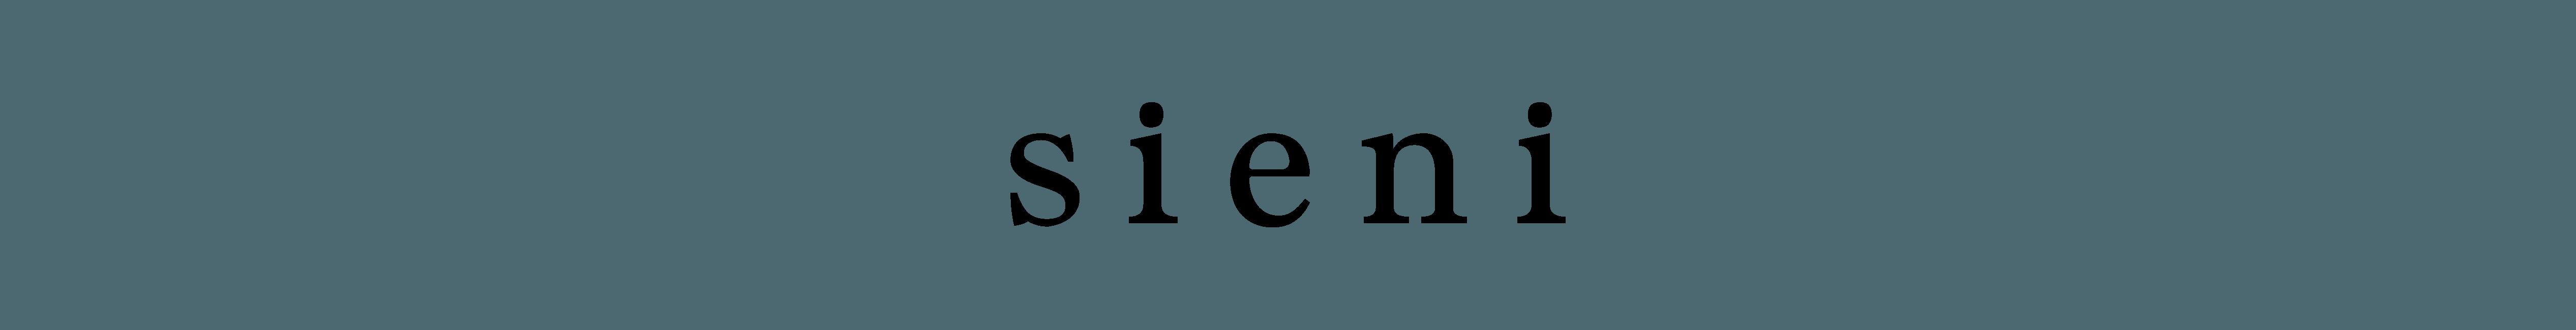 sieni -Online Store-